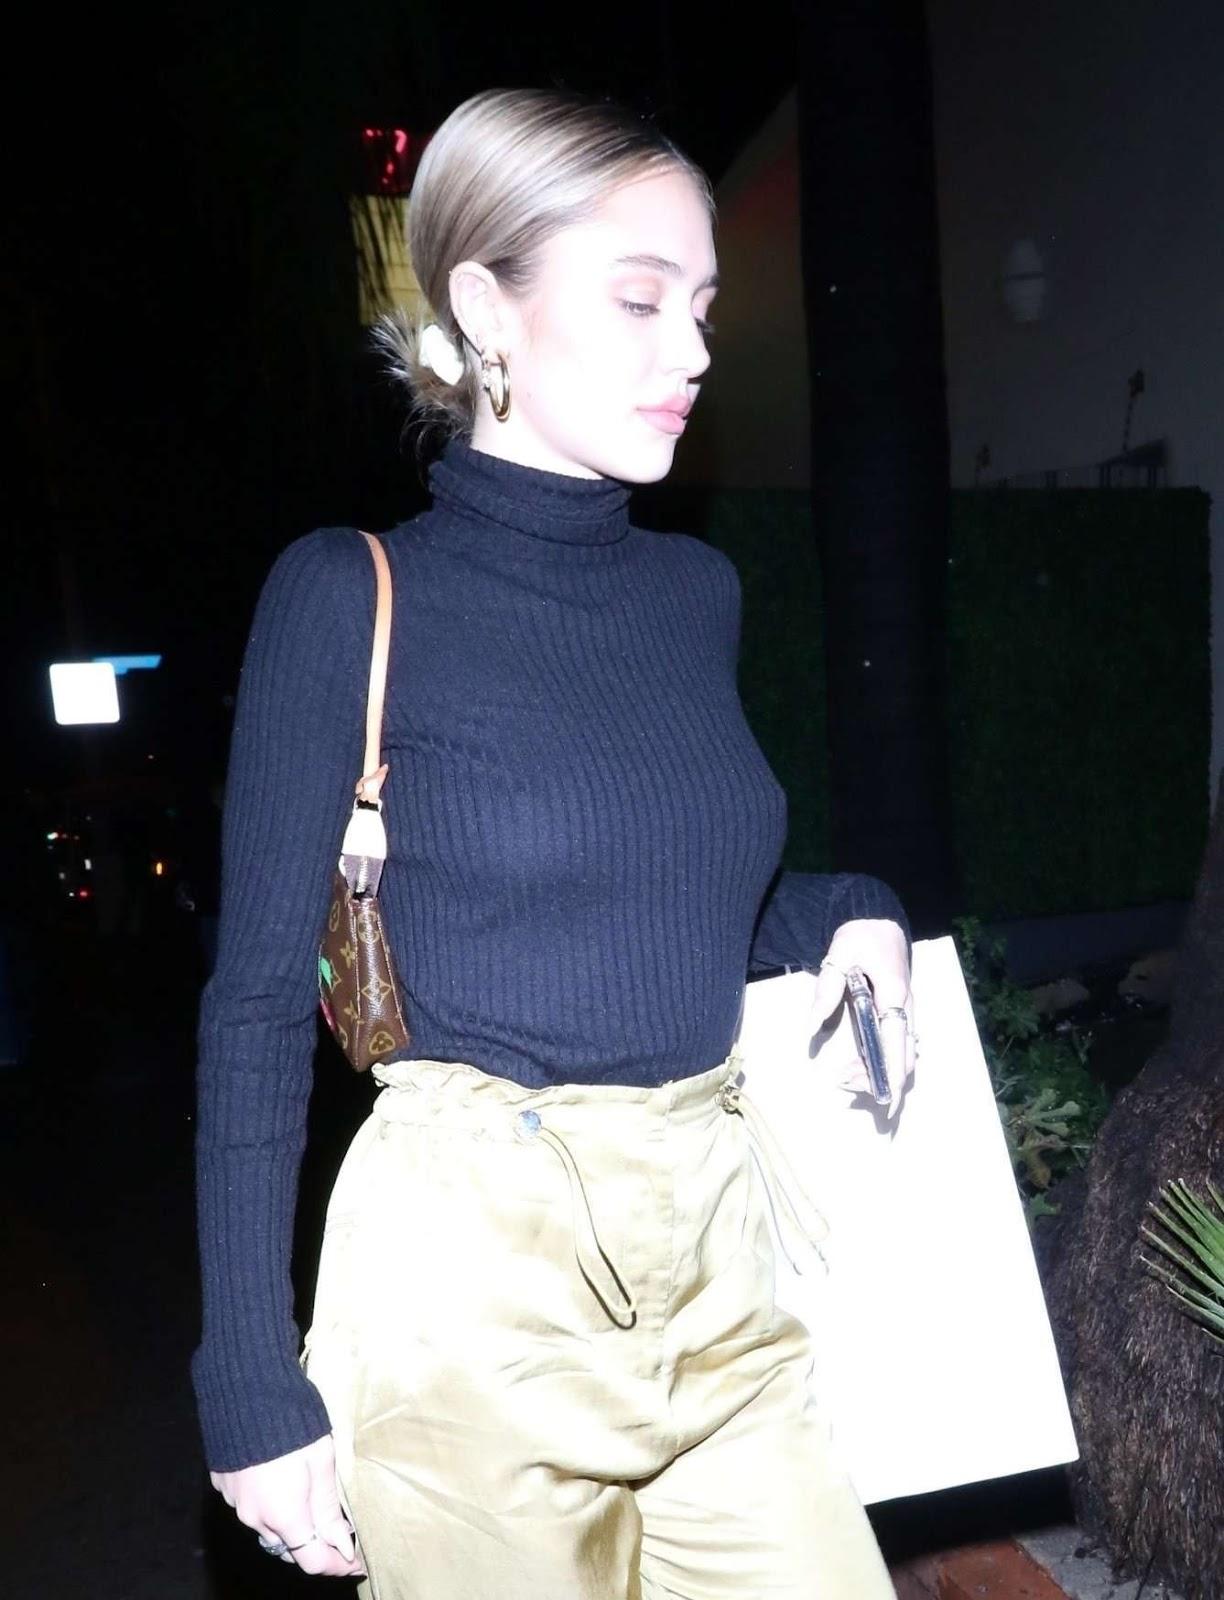 Delilah Belle Hamlin Pokies, Out in West Hollywood -  03/06/19